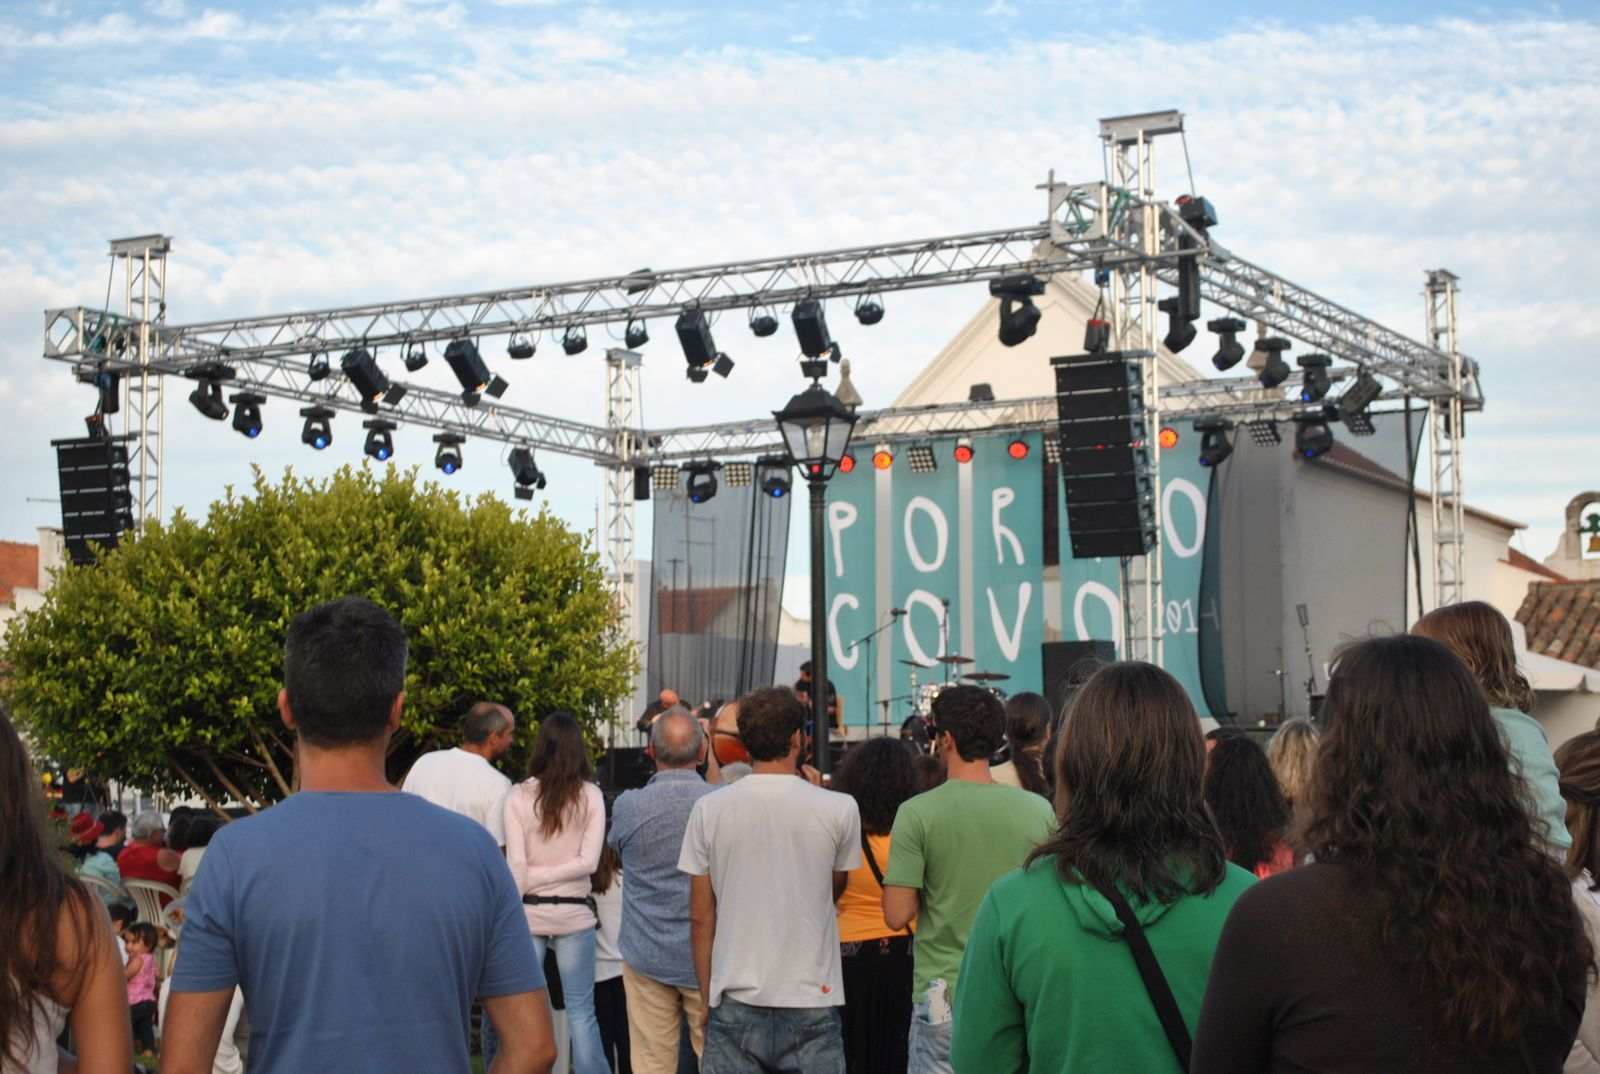 Suivez-moi à Porto Covo, Portugal